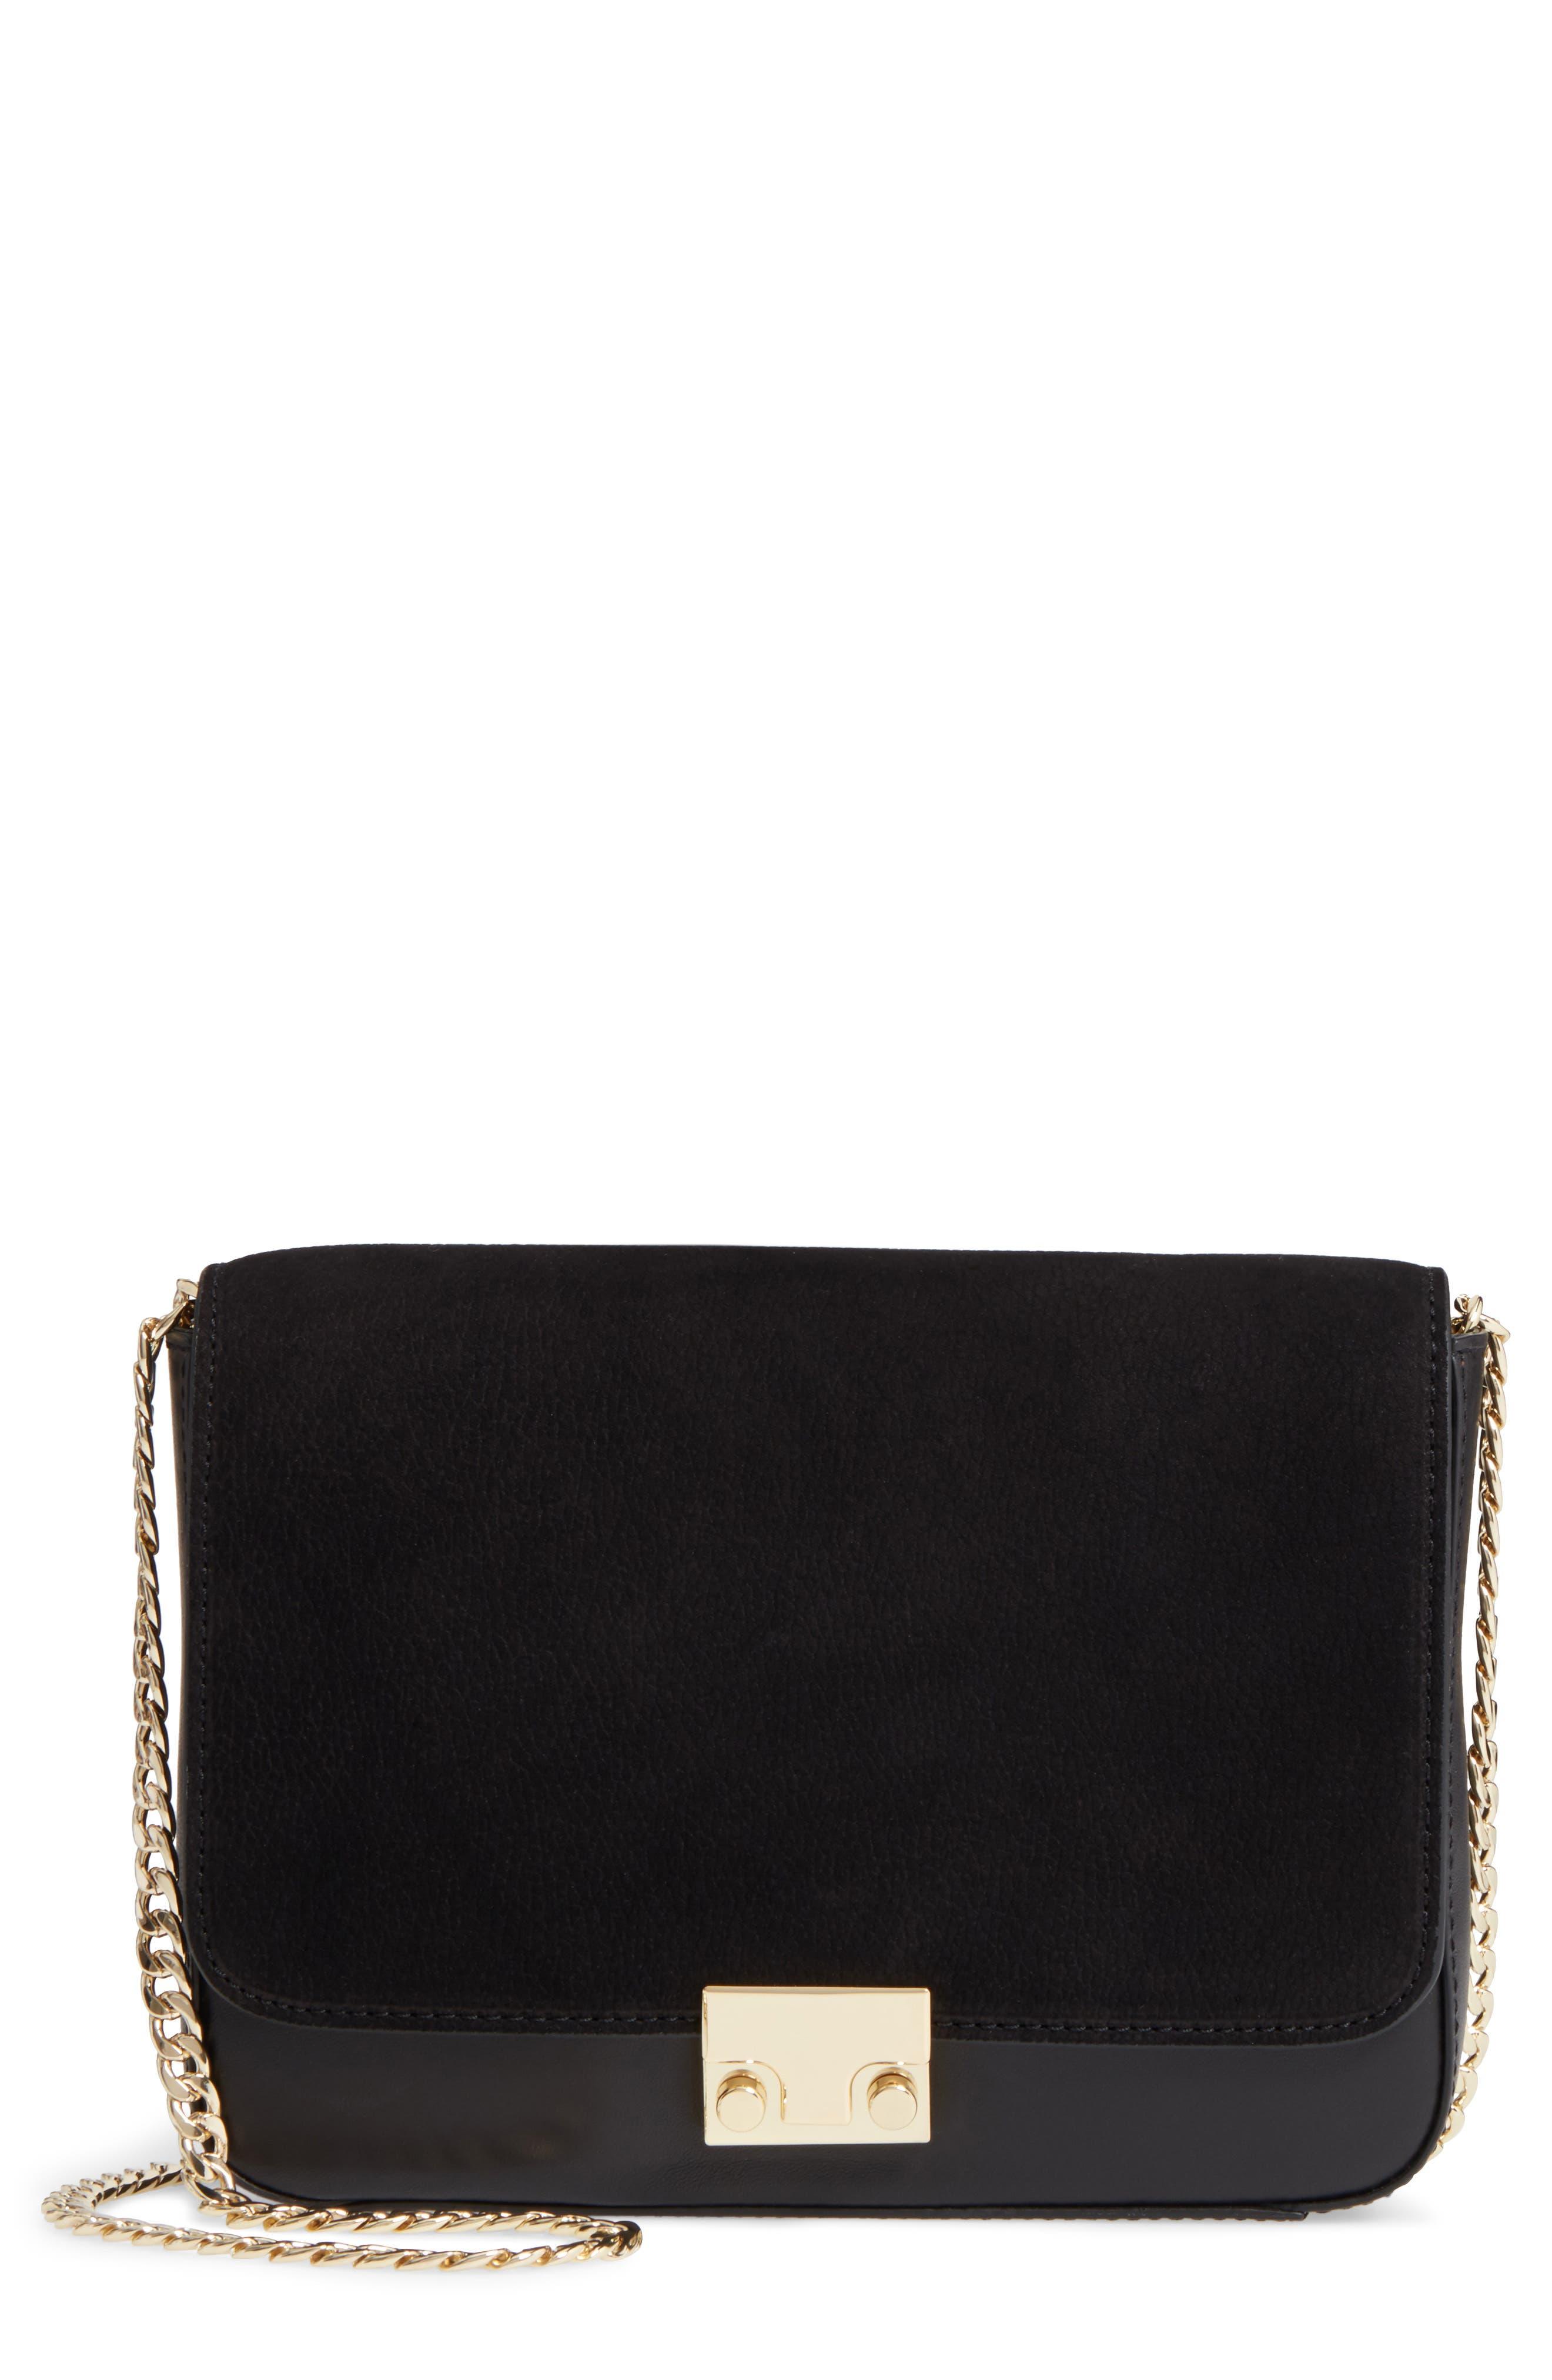 Lock Shoulder Bag,                             Main thumbnail 1, color,                             Black